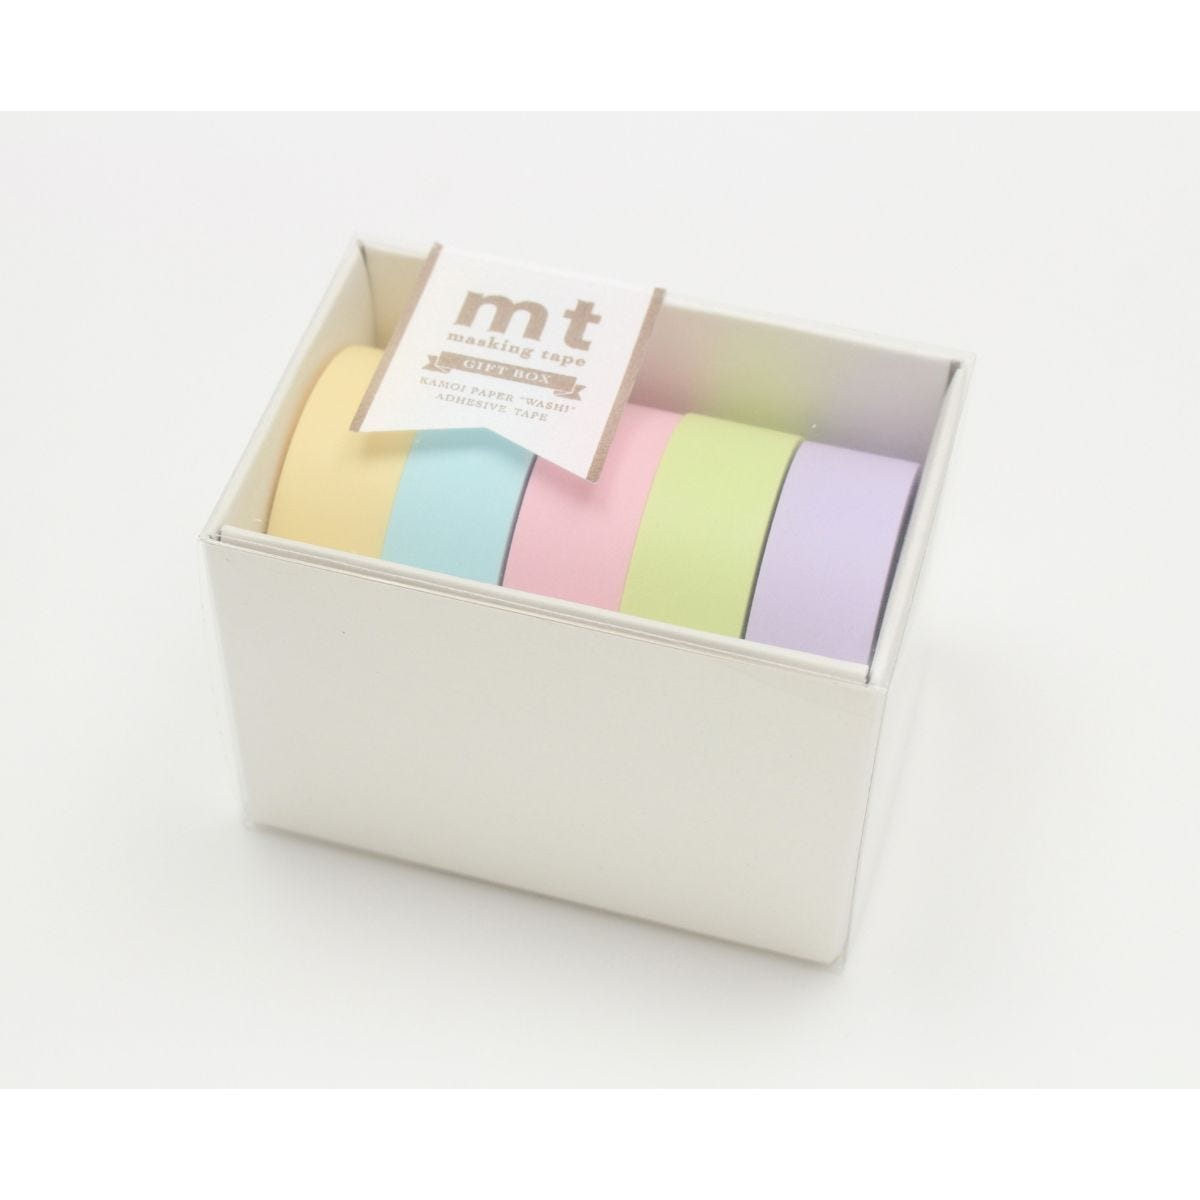 mt Washi Masking Tape Gift Box Pastel Pack of 5